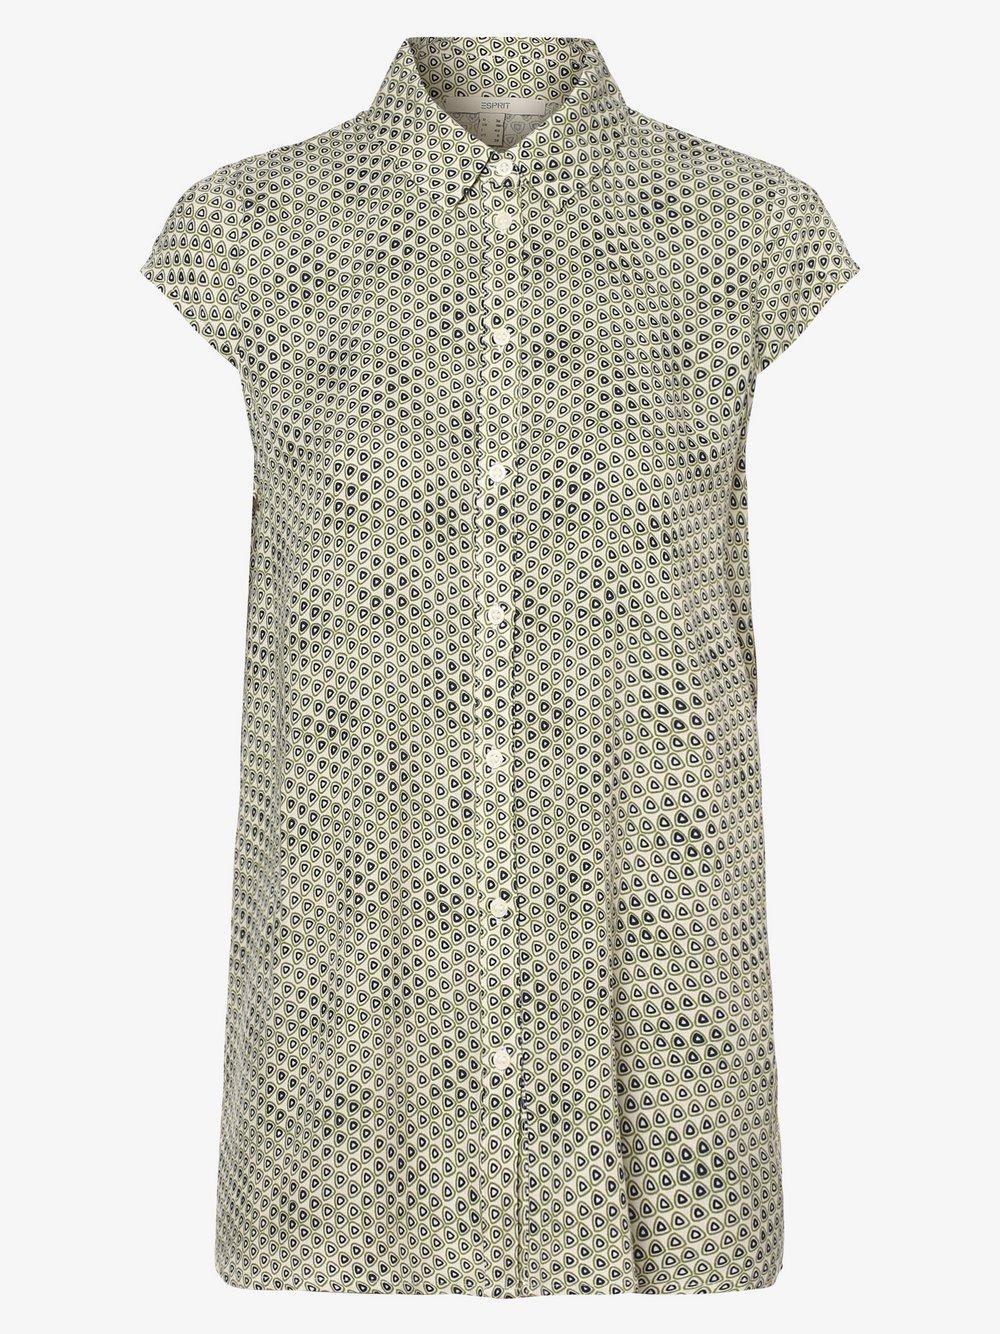 Esprit Casual – Bluzka damska, beżowy Van Graaf 479562-0001-00380